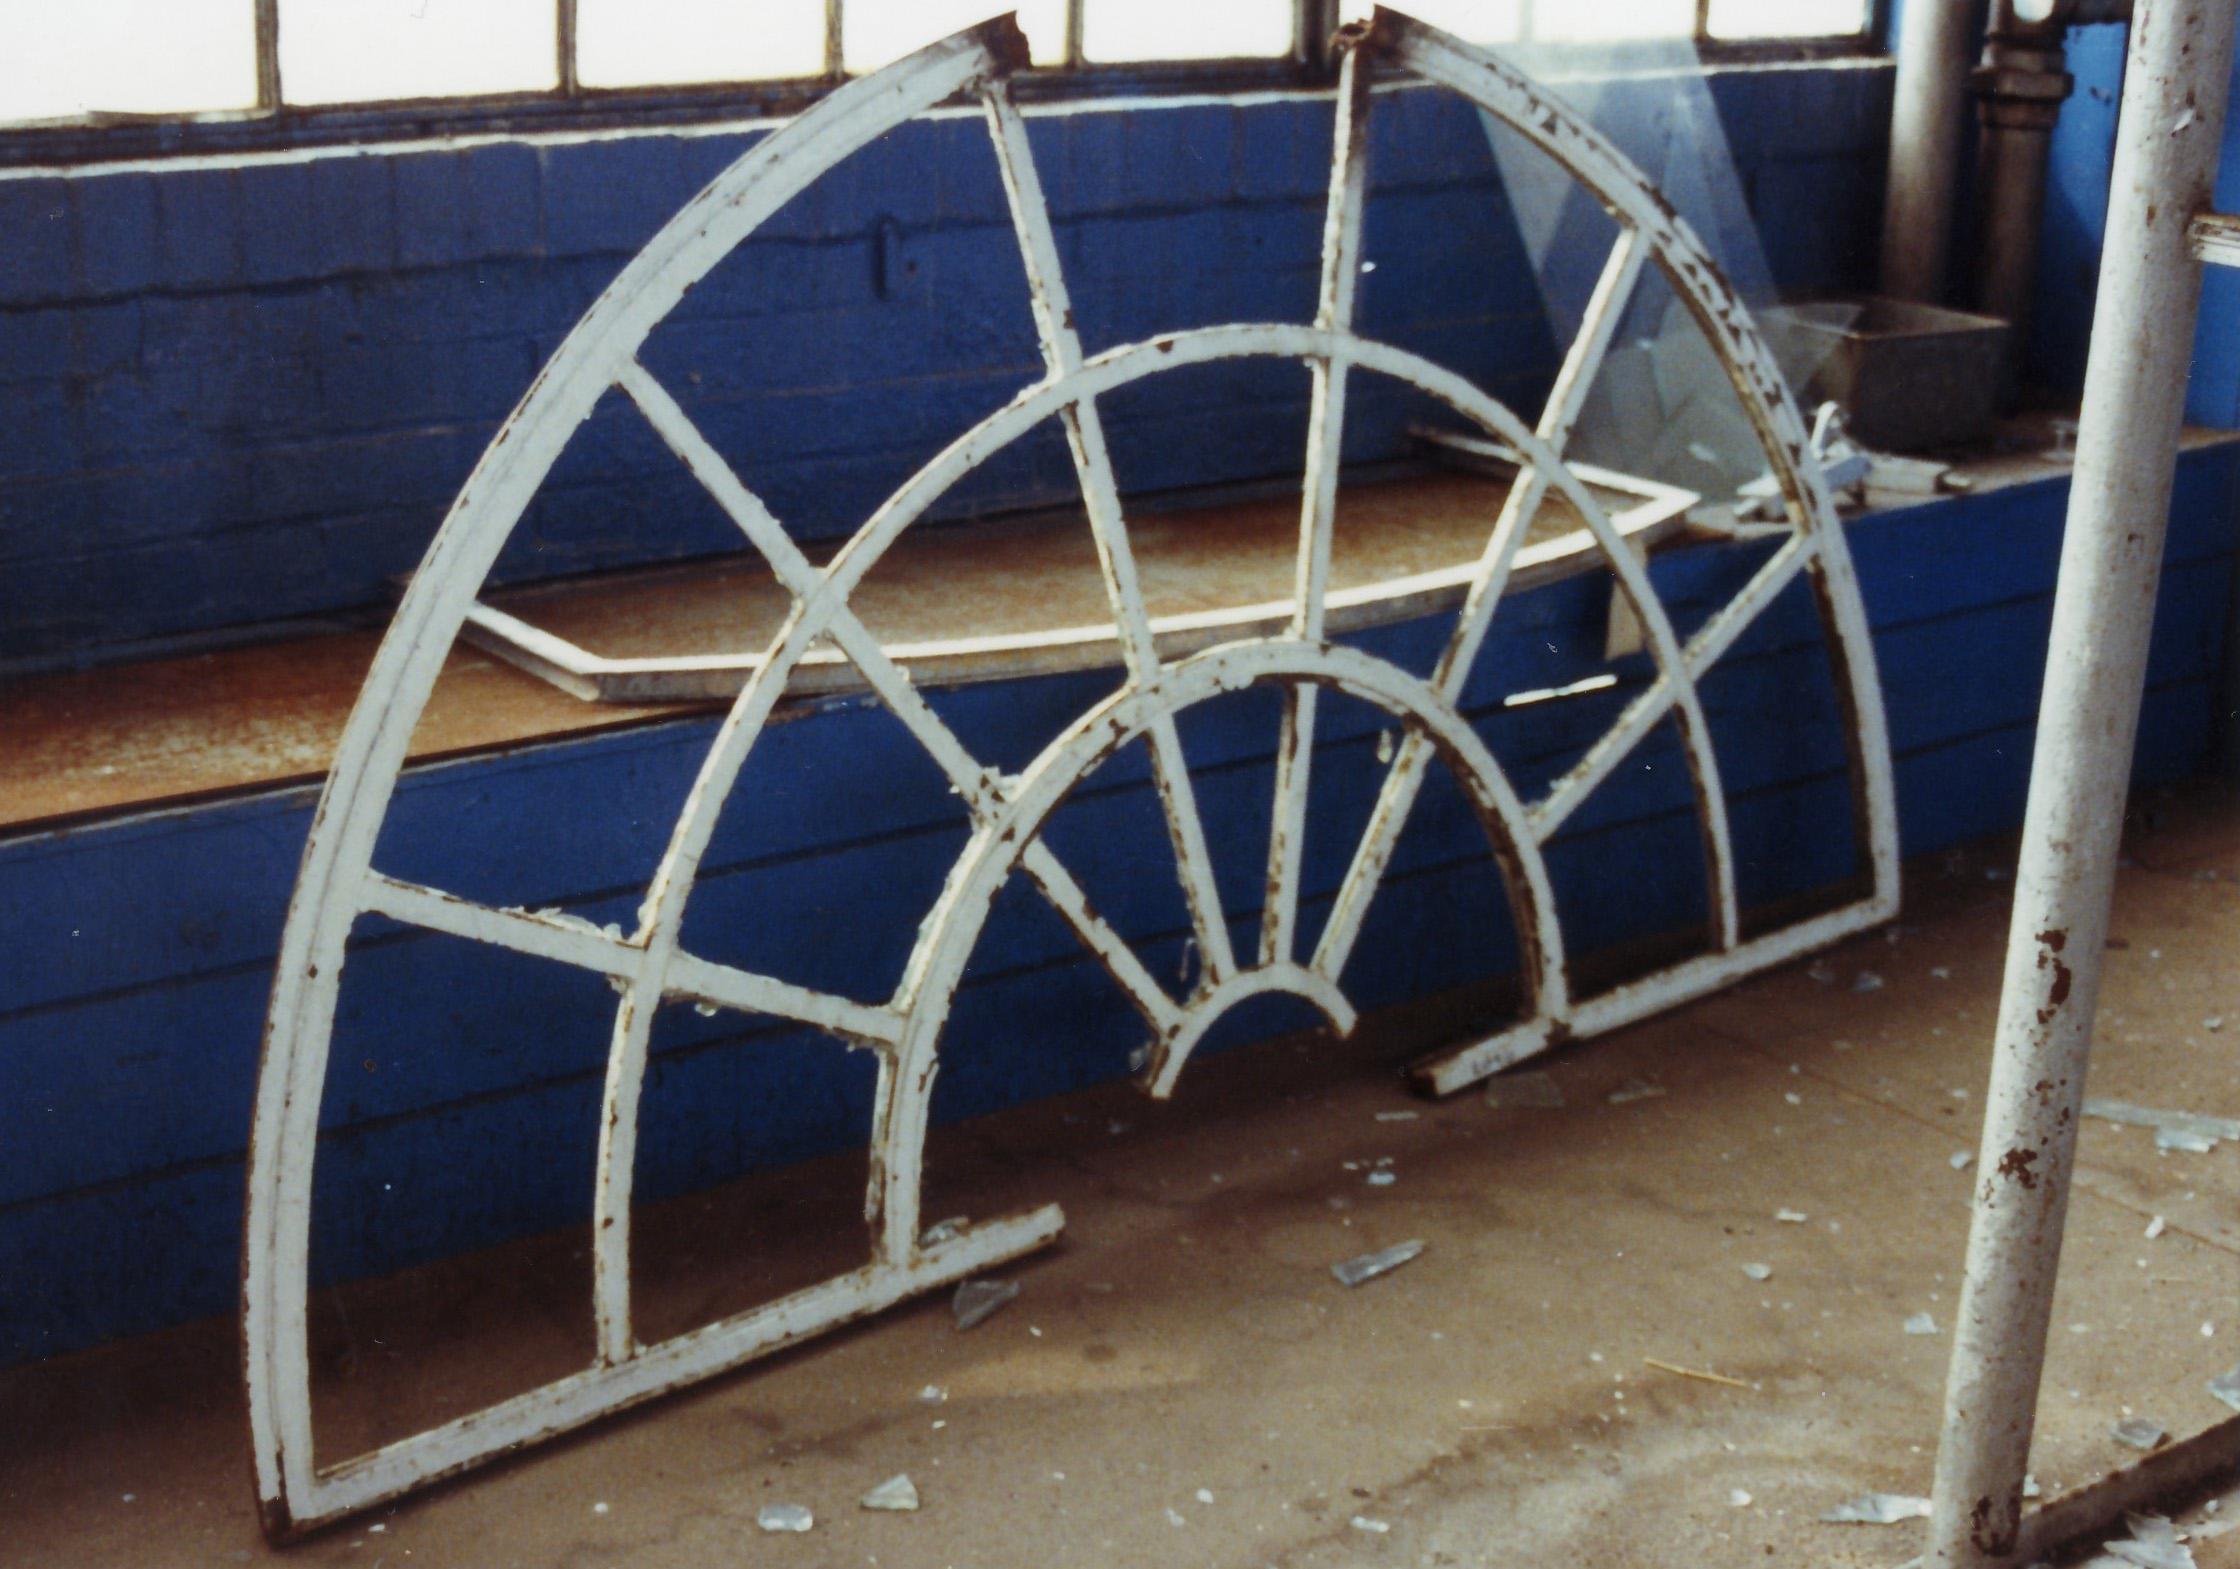 p-064-18-crittalls-semi-circular-frame